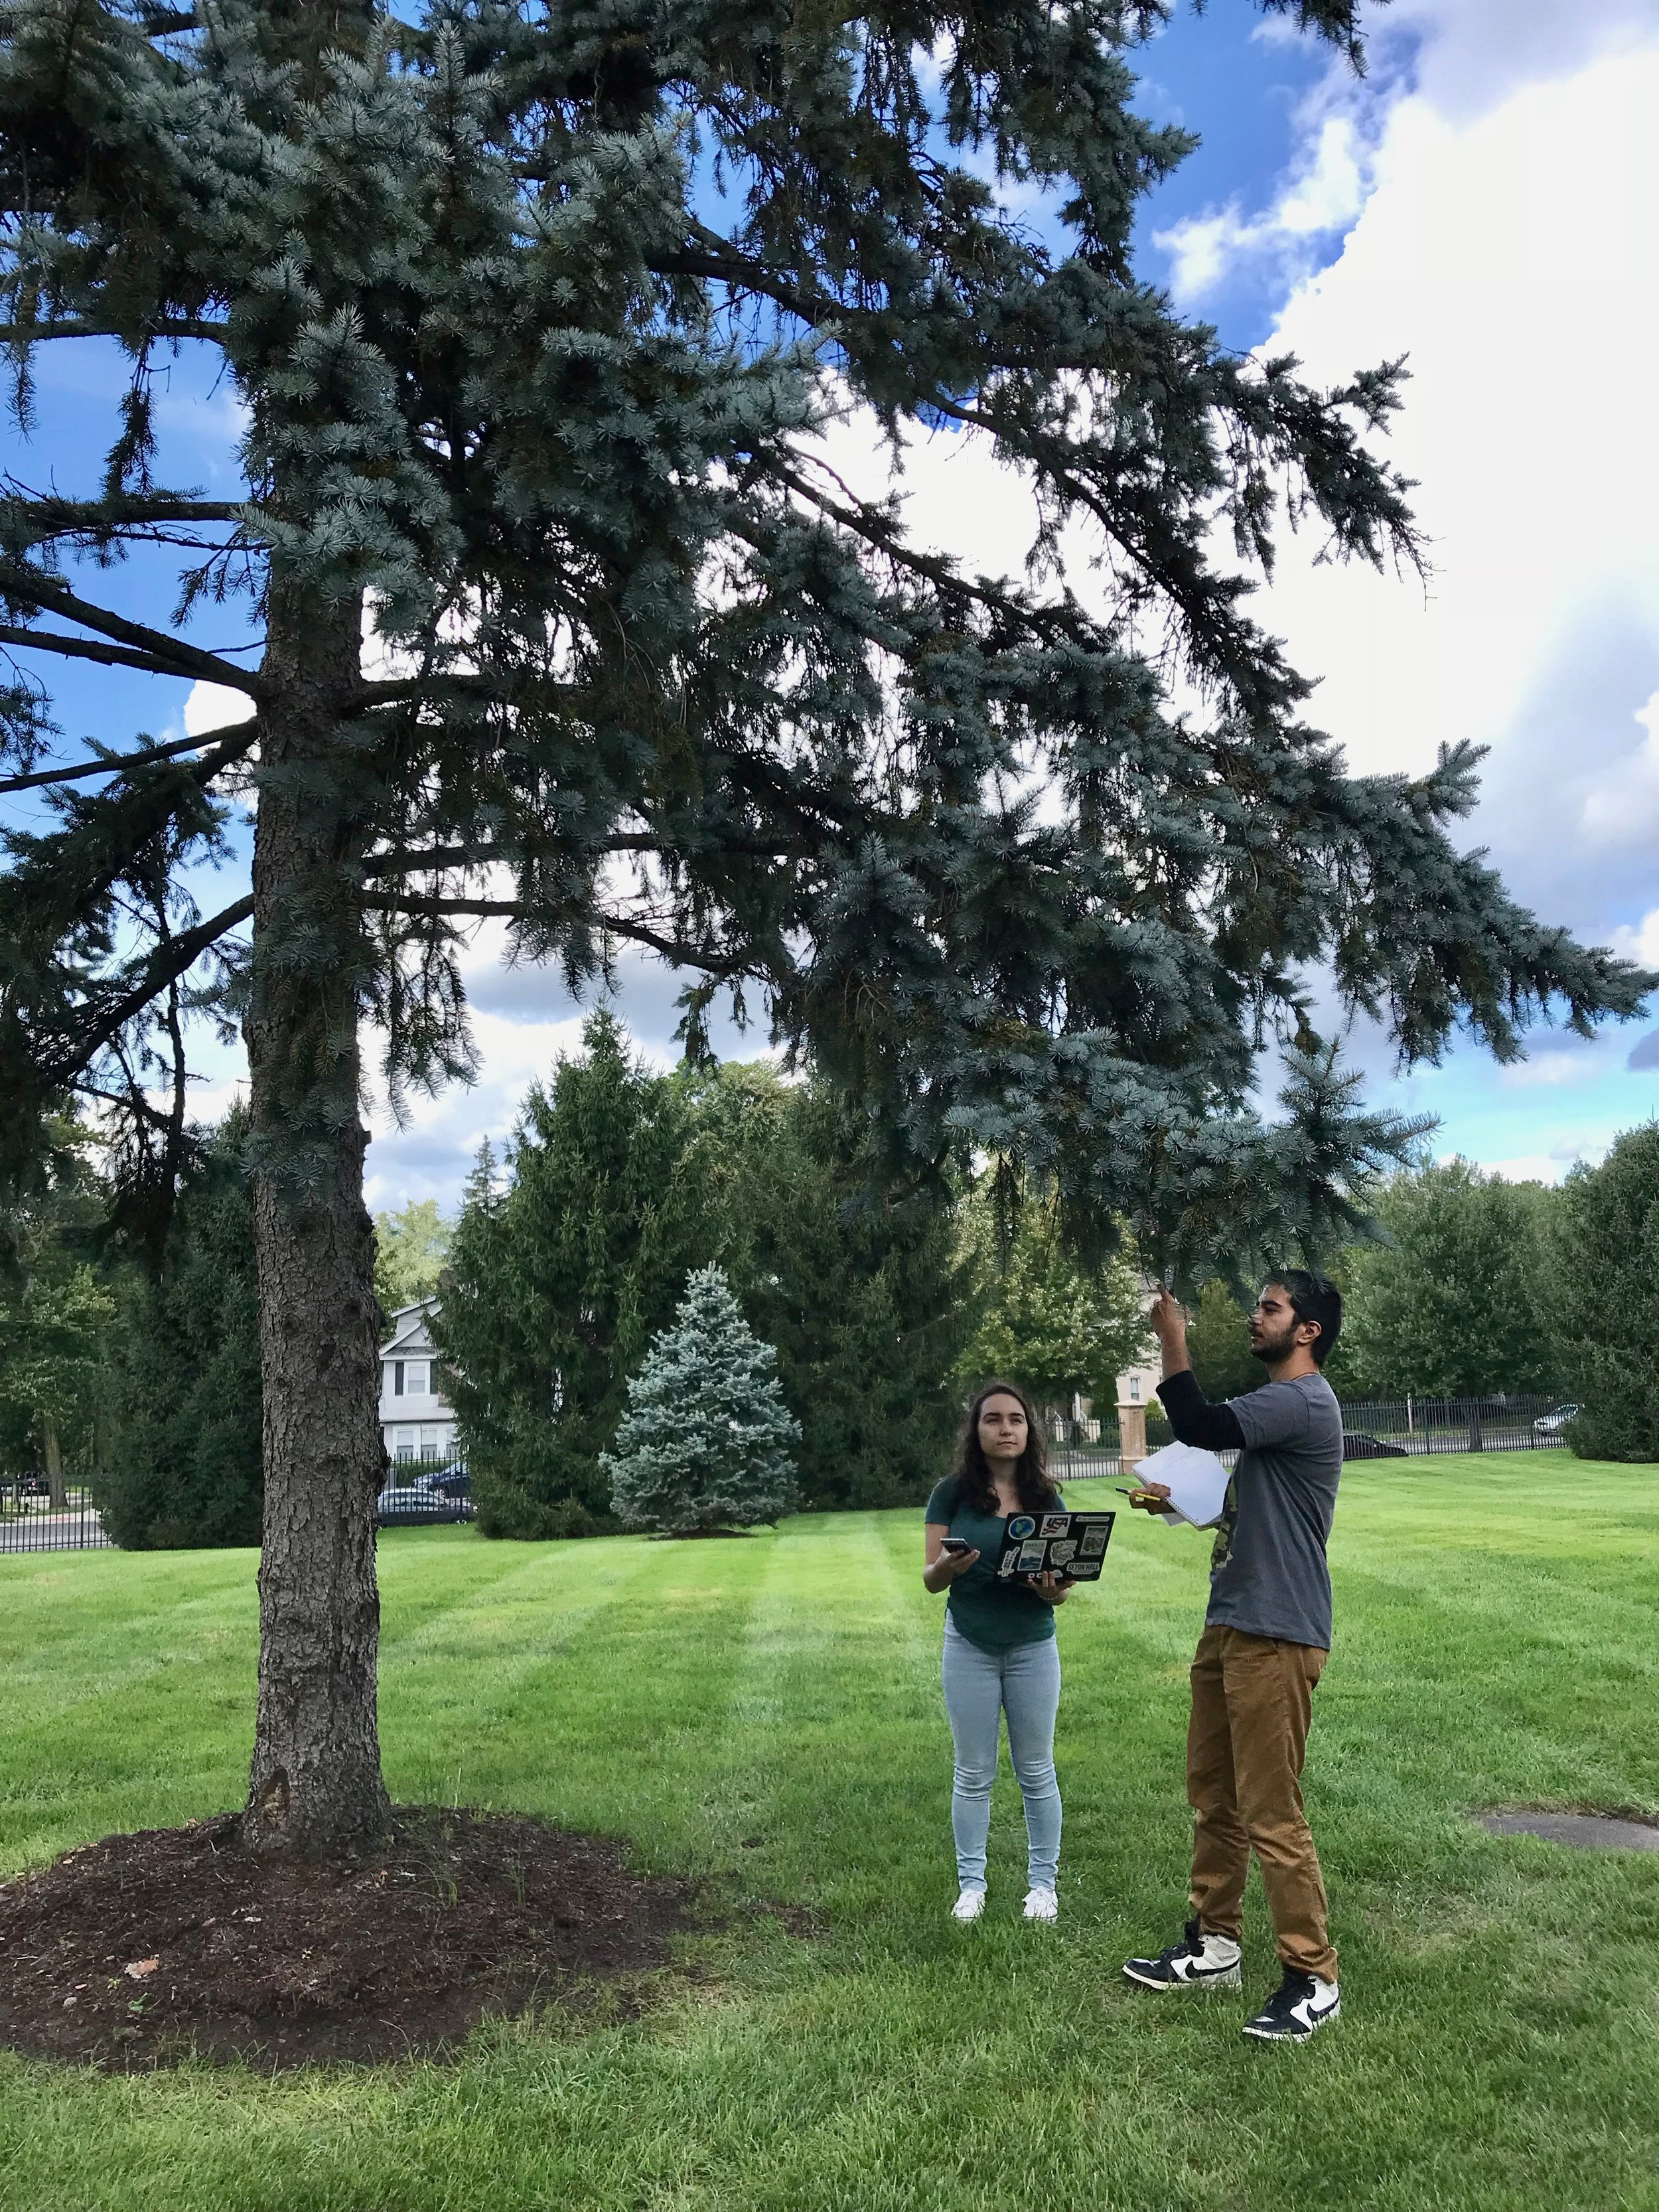 Seton Hall students Saveria Antonacci and Maharsh Barot identifying trees on campus.